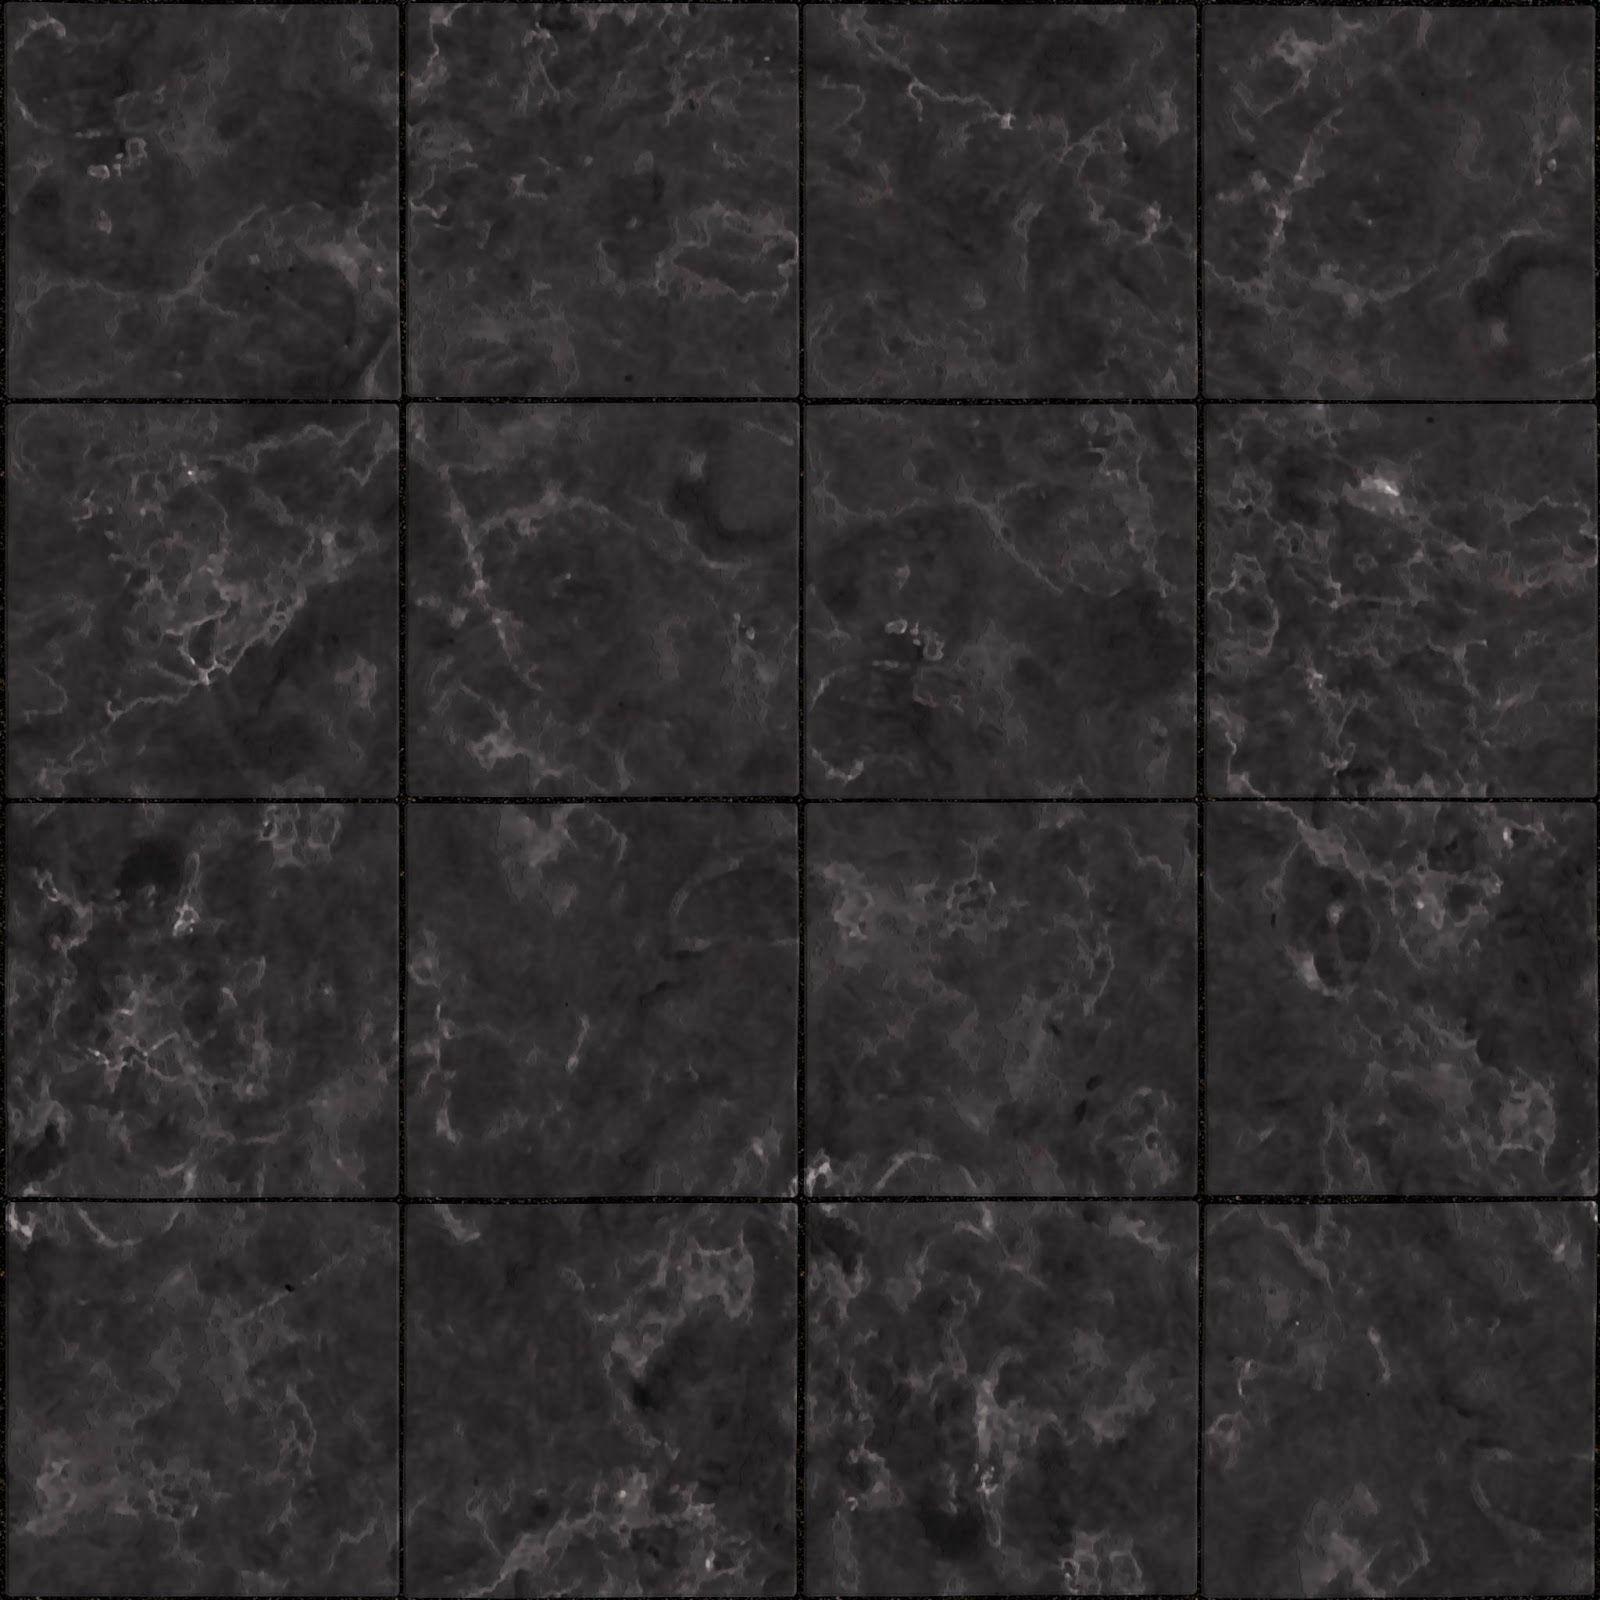 Tileable Marble Floor Tile Texture 5 1600